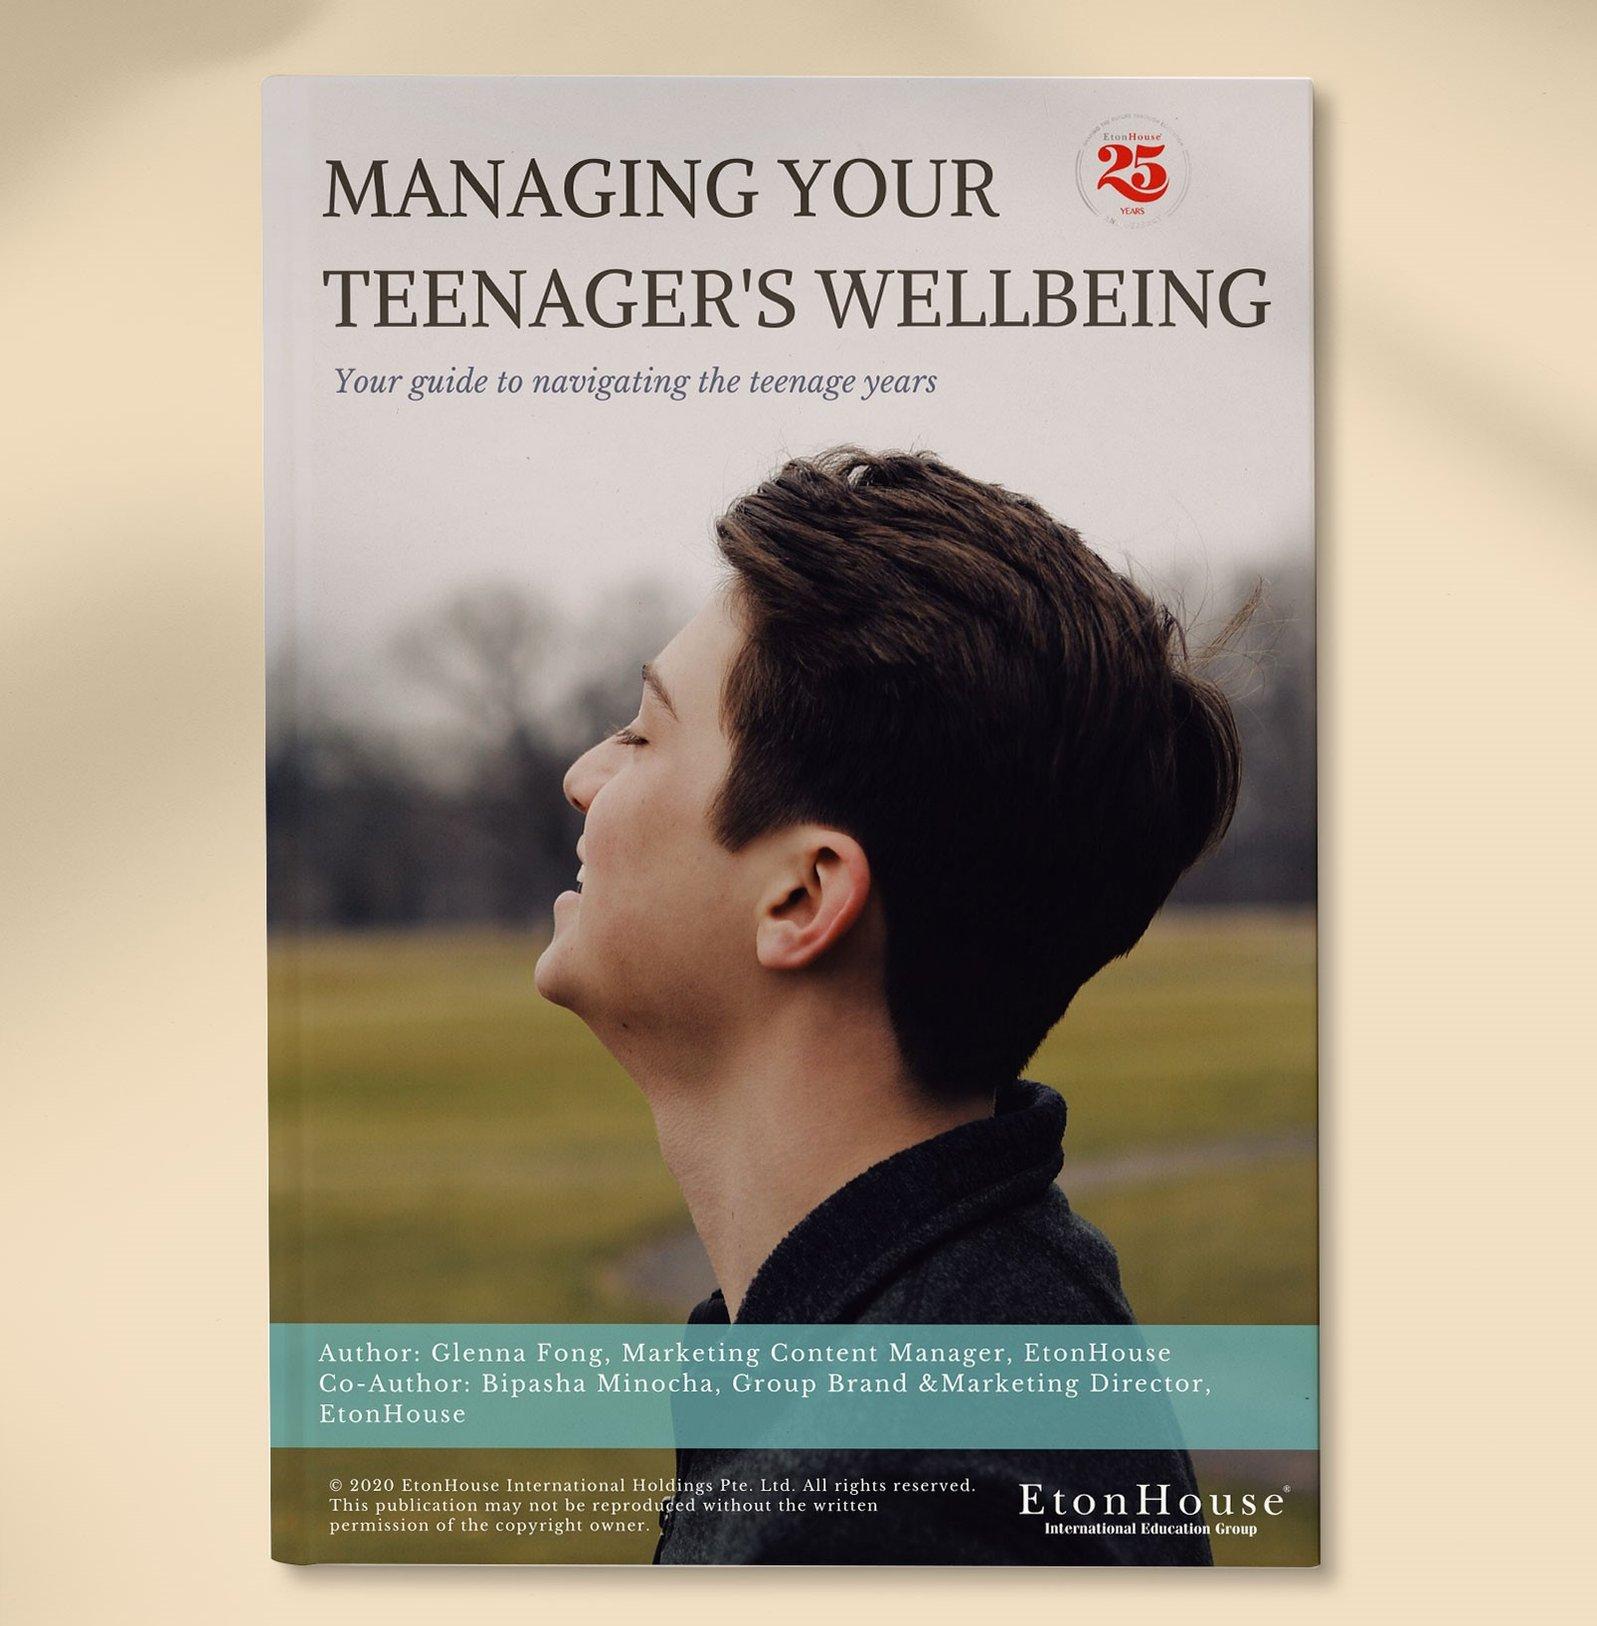 EtonHouse EBook - Managing Your Teenager's Wellbeing